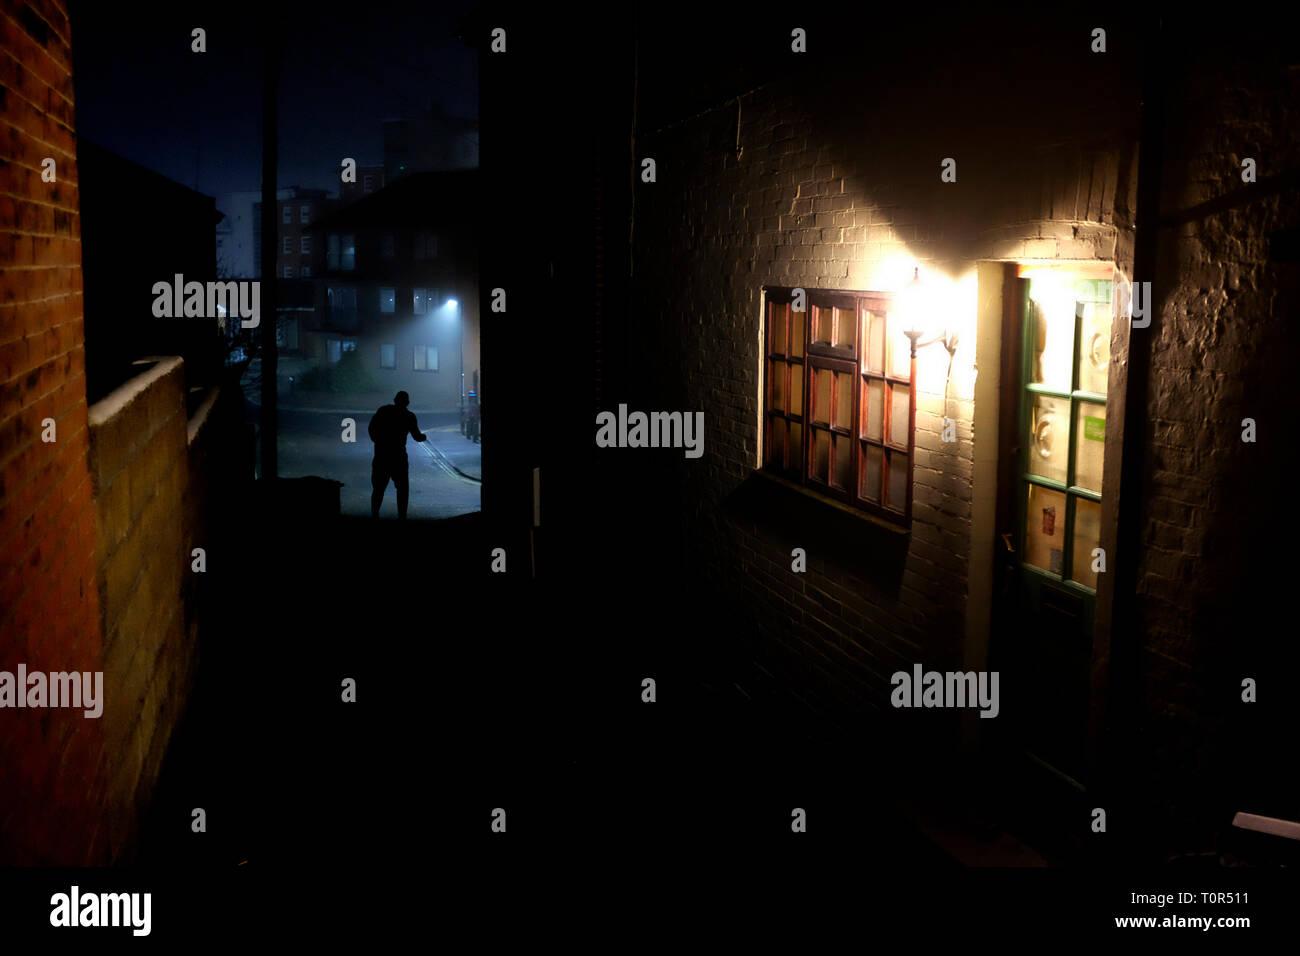 Finstere, Abbildung, in, Silhouette, Silhouette, at, Ende, der, Gasse, Gasse, Haus, Beleuchtung, front, Tür, Kriminelle, Verbrechen, Mord, Mörder, Angst, der, Nacht, dunkel, Schatten, l Stockbild